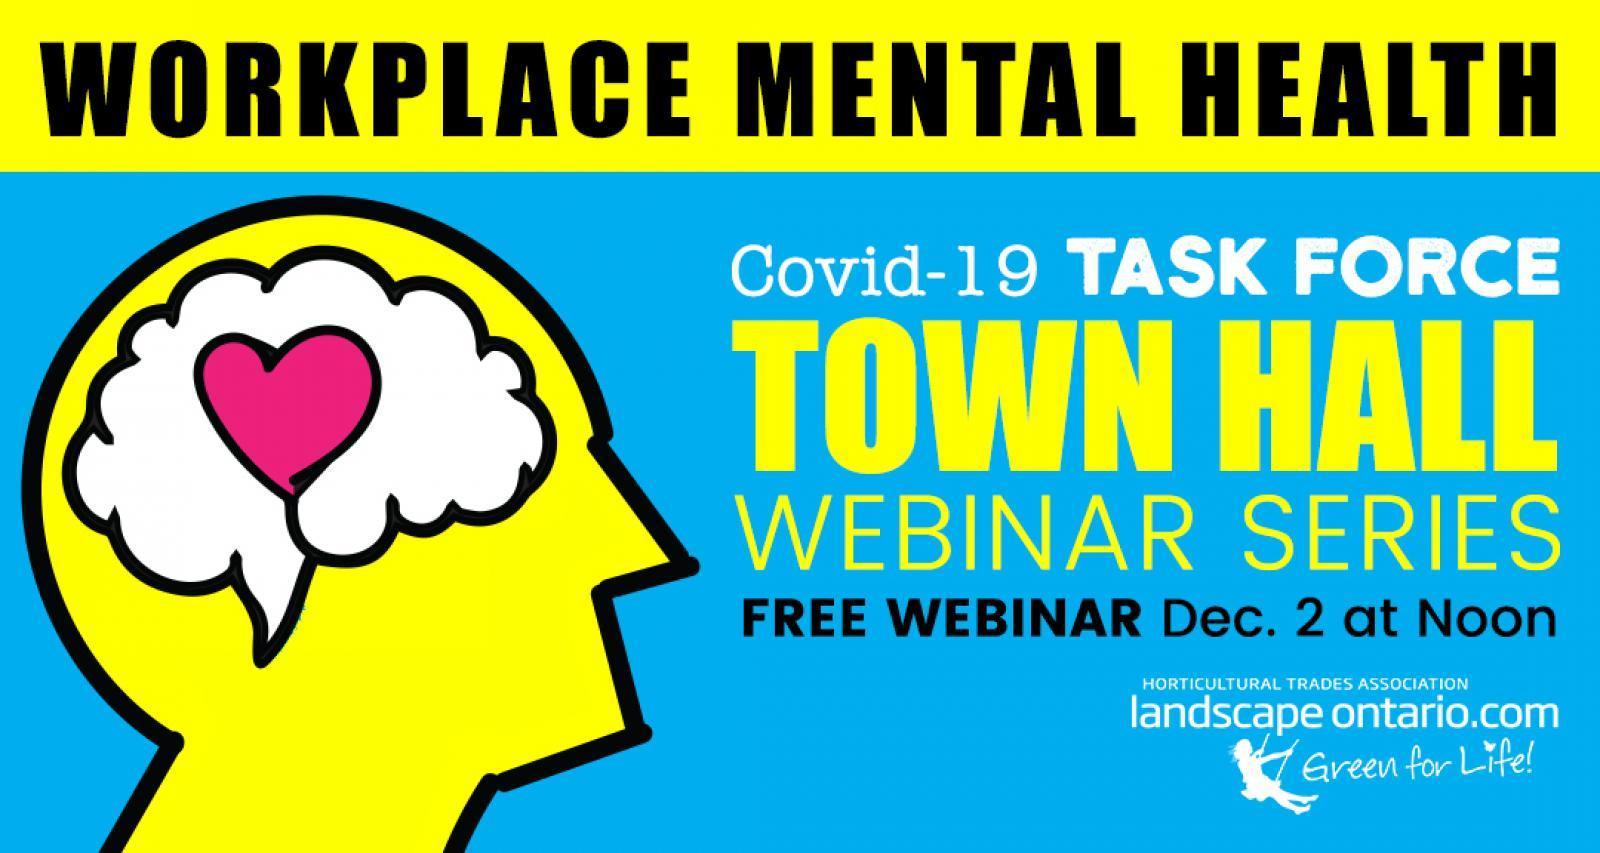 Workplace Mental Health Webinar